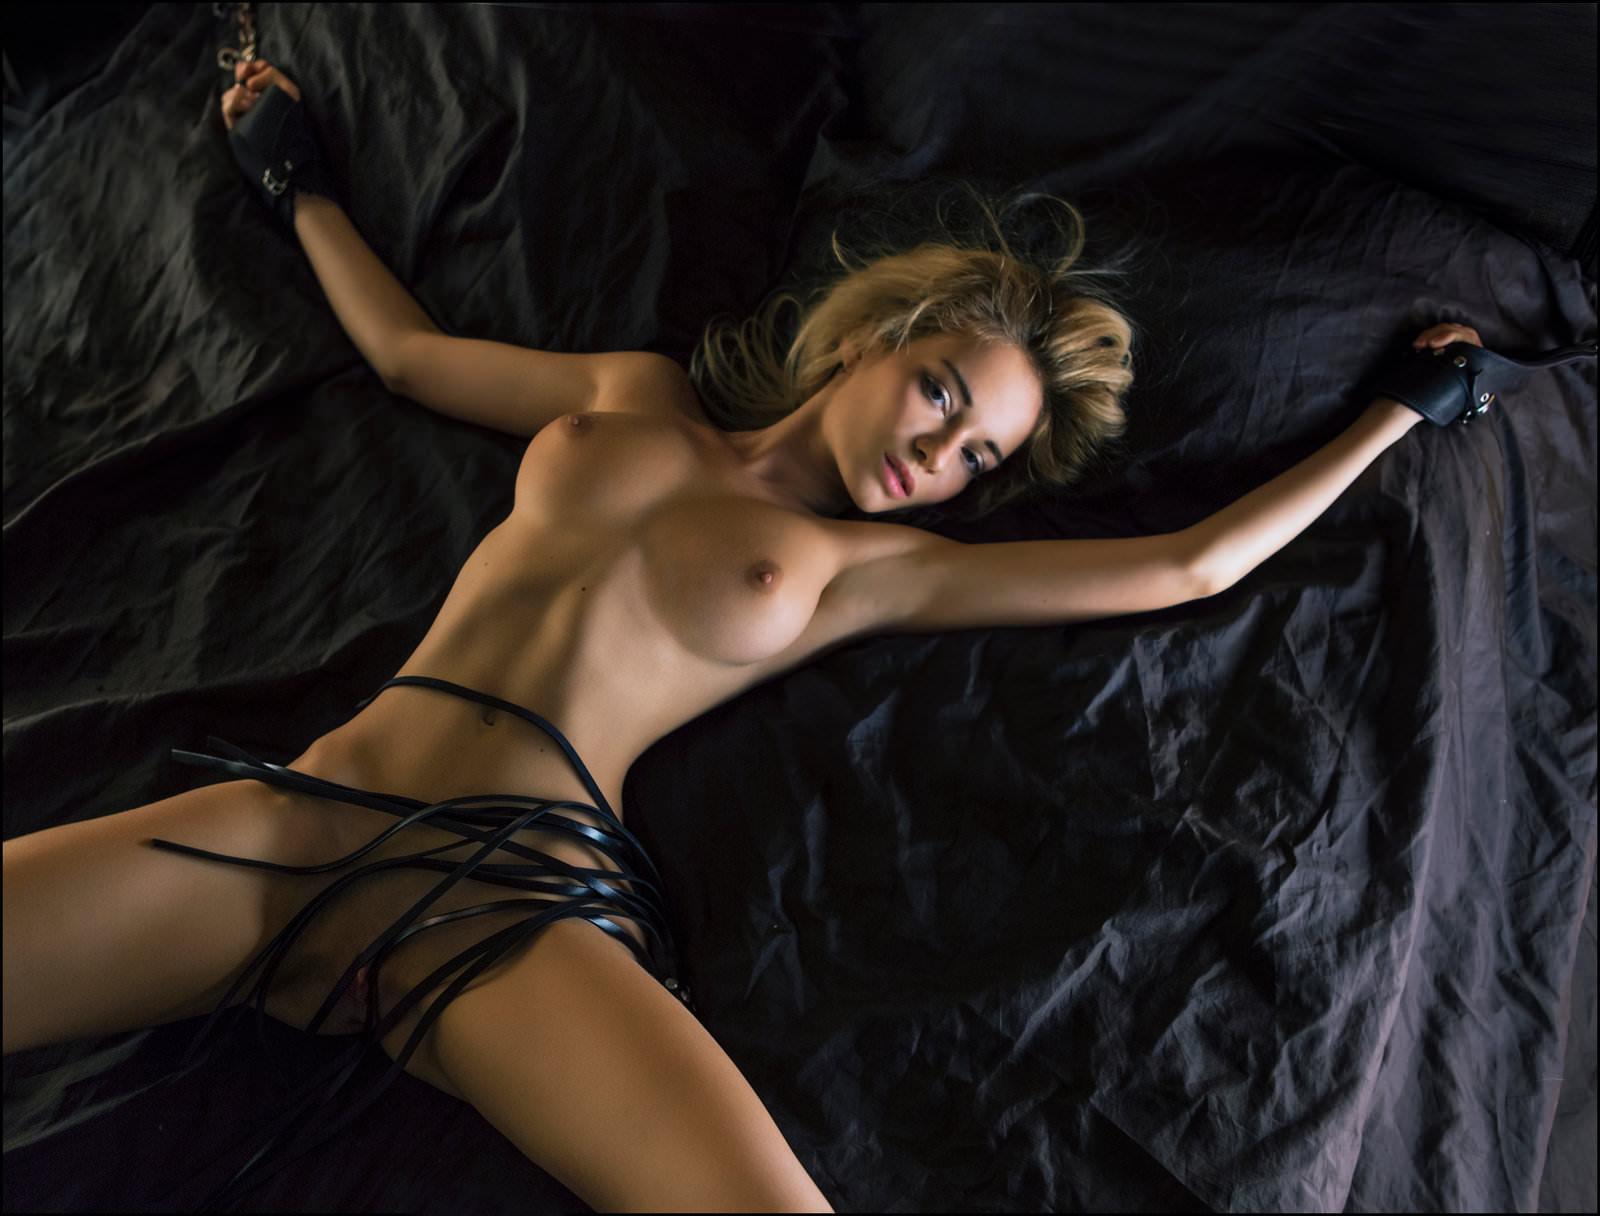 Adult Bondage Porn gospel of bondage porn pic - eporner